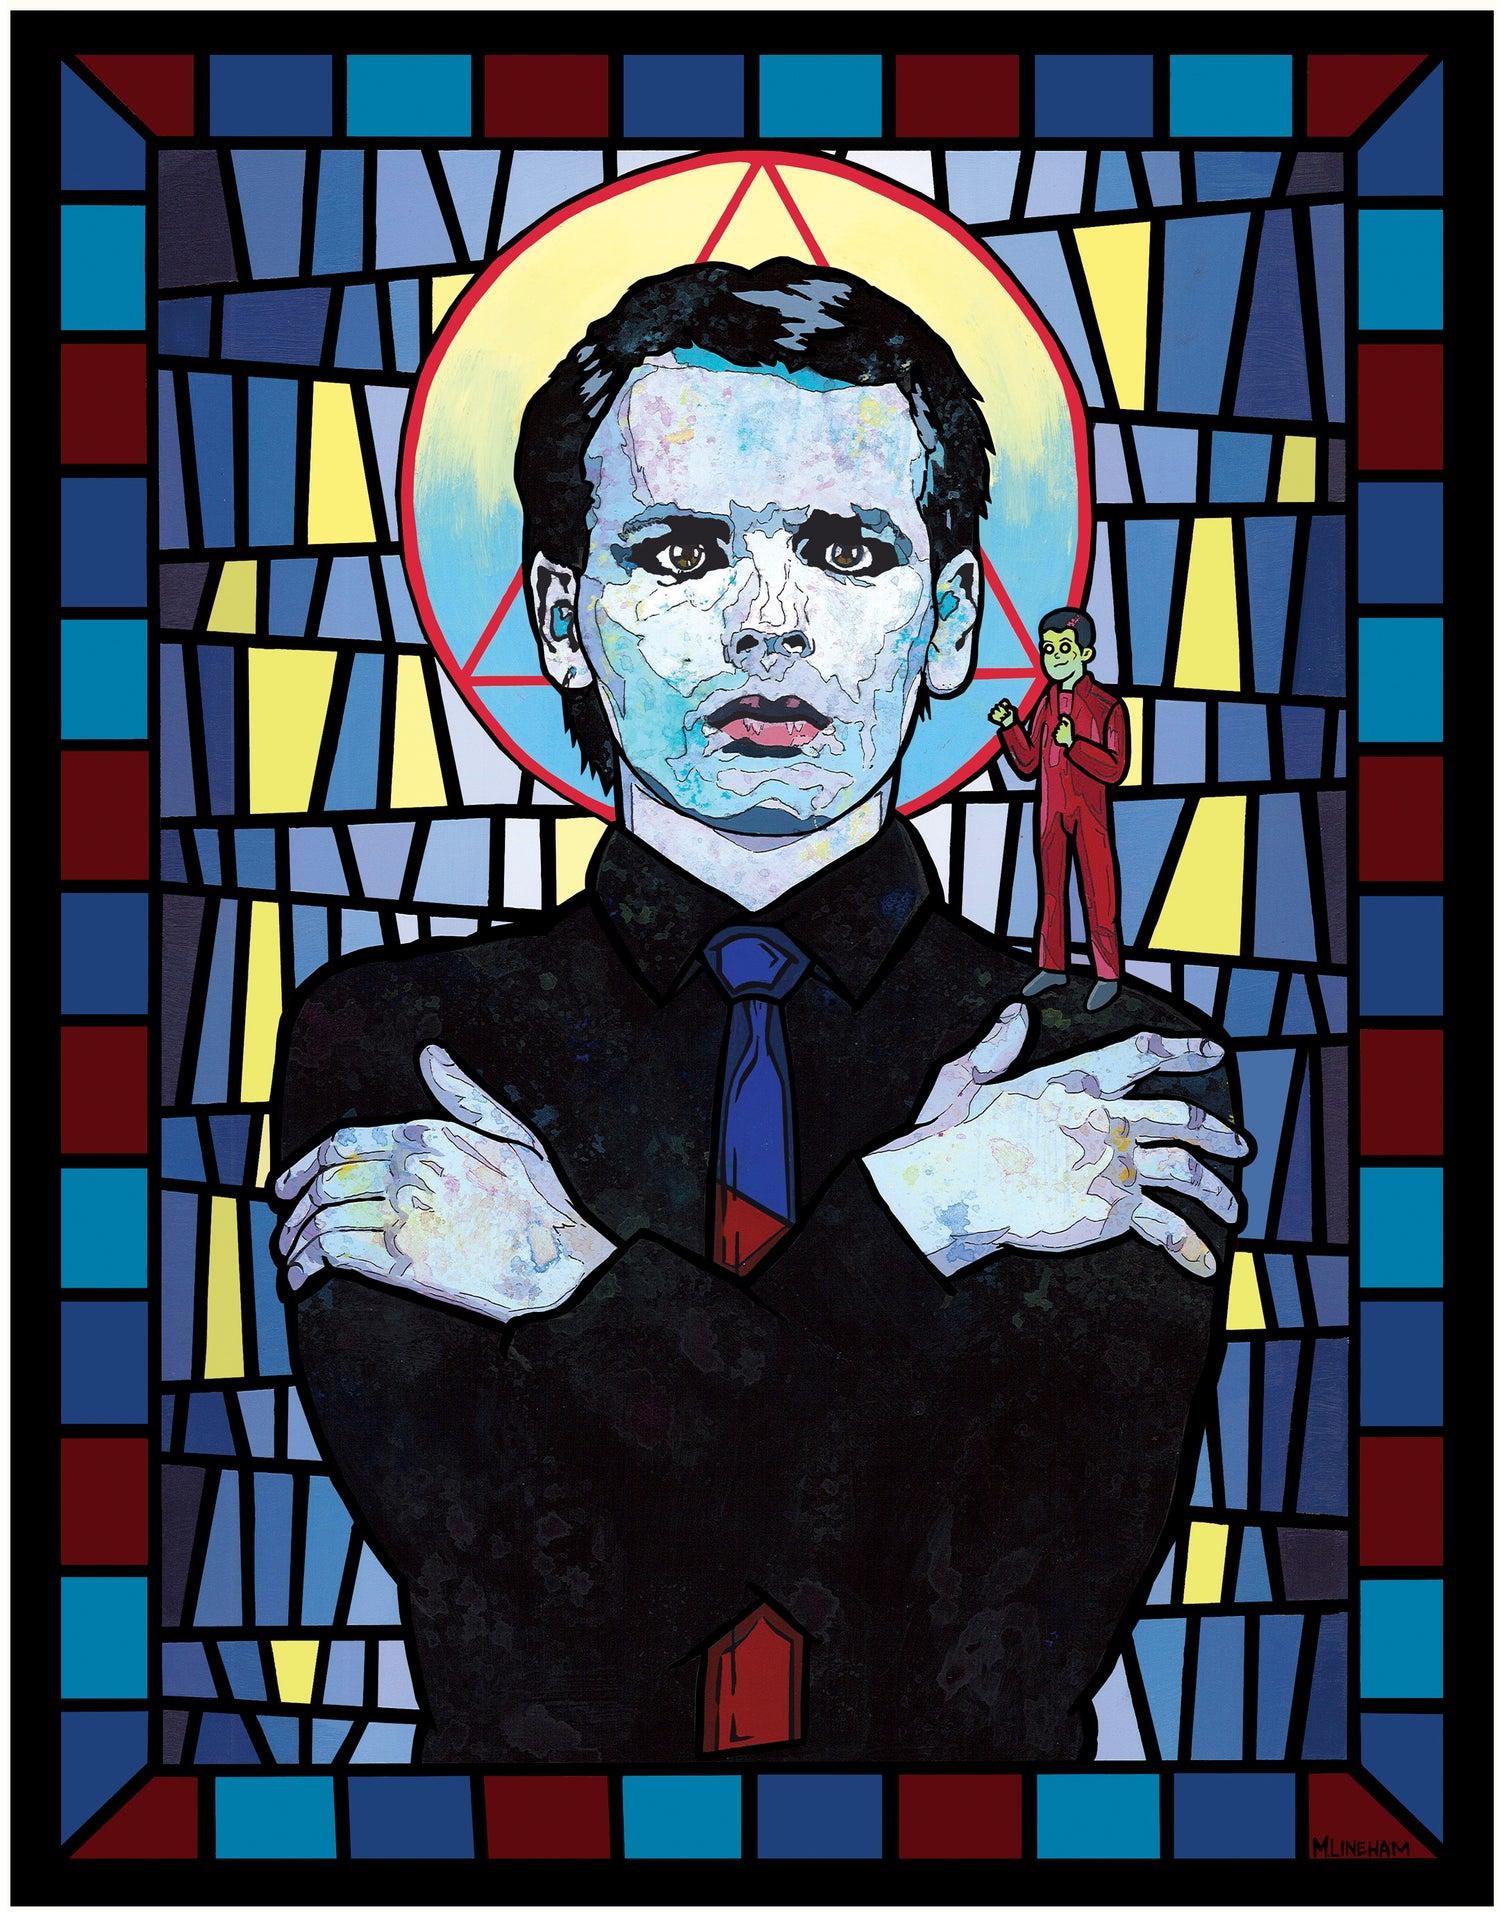 Image of Saint Gary Numan